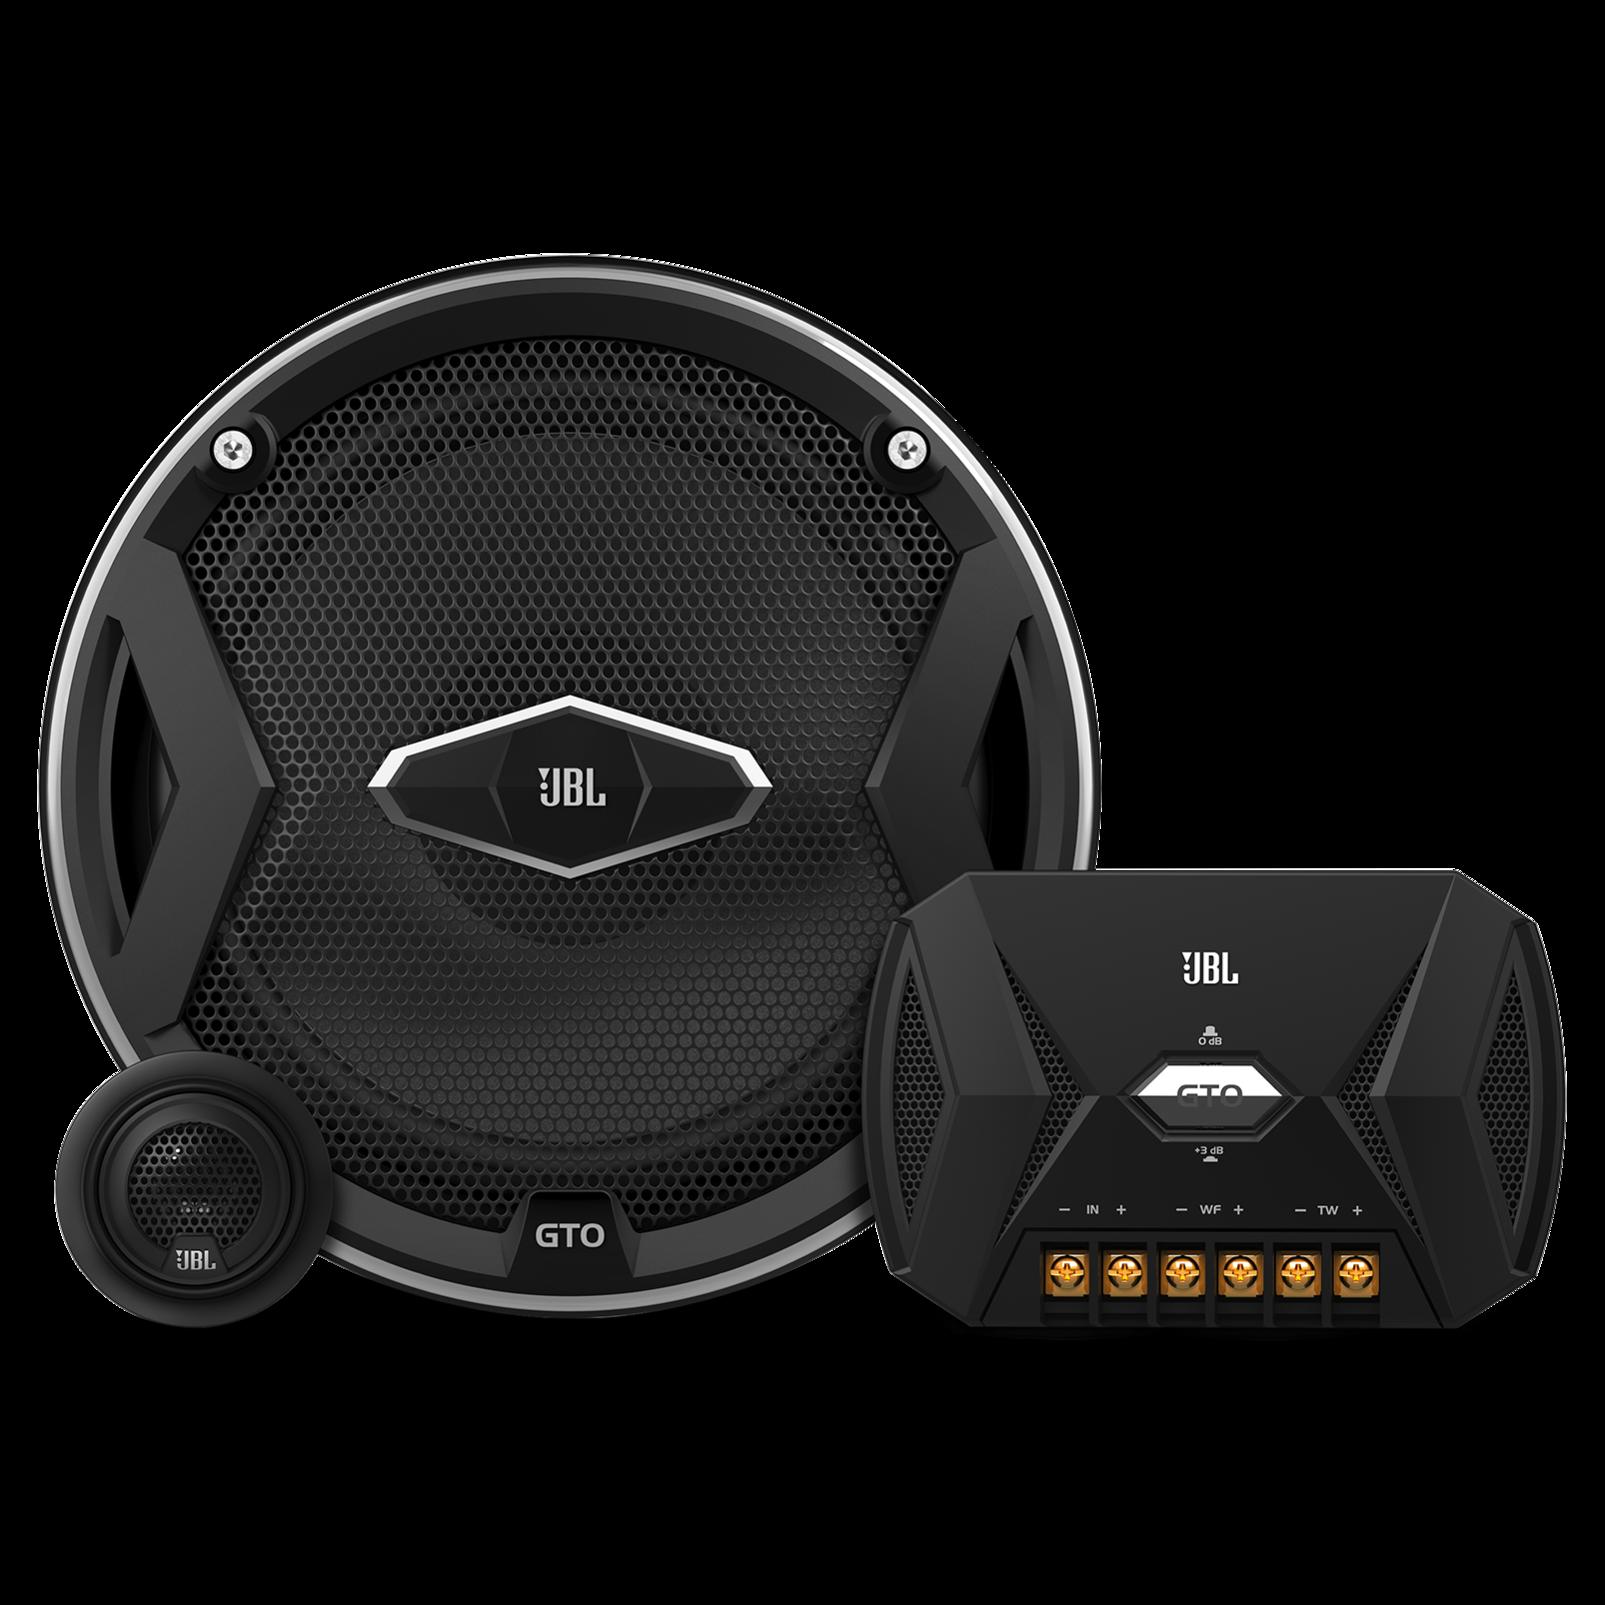 Gto609c 270 Watt 6 1 2 Two Way Component System Kicker Car Speakers Best Buy On 12 Inch Alpine Type R Wiring Diagram